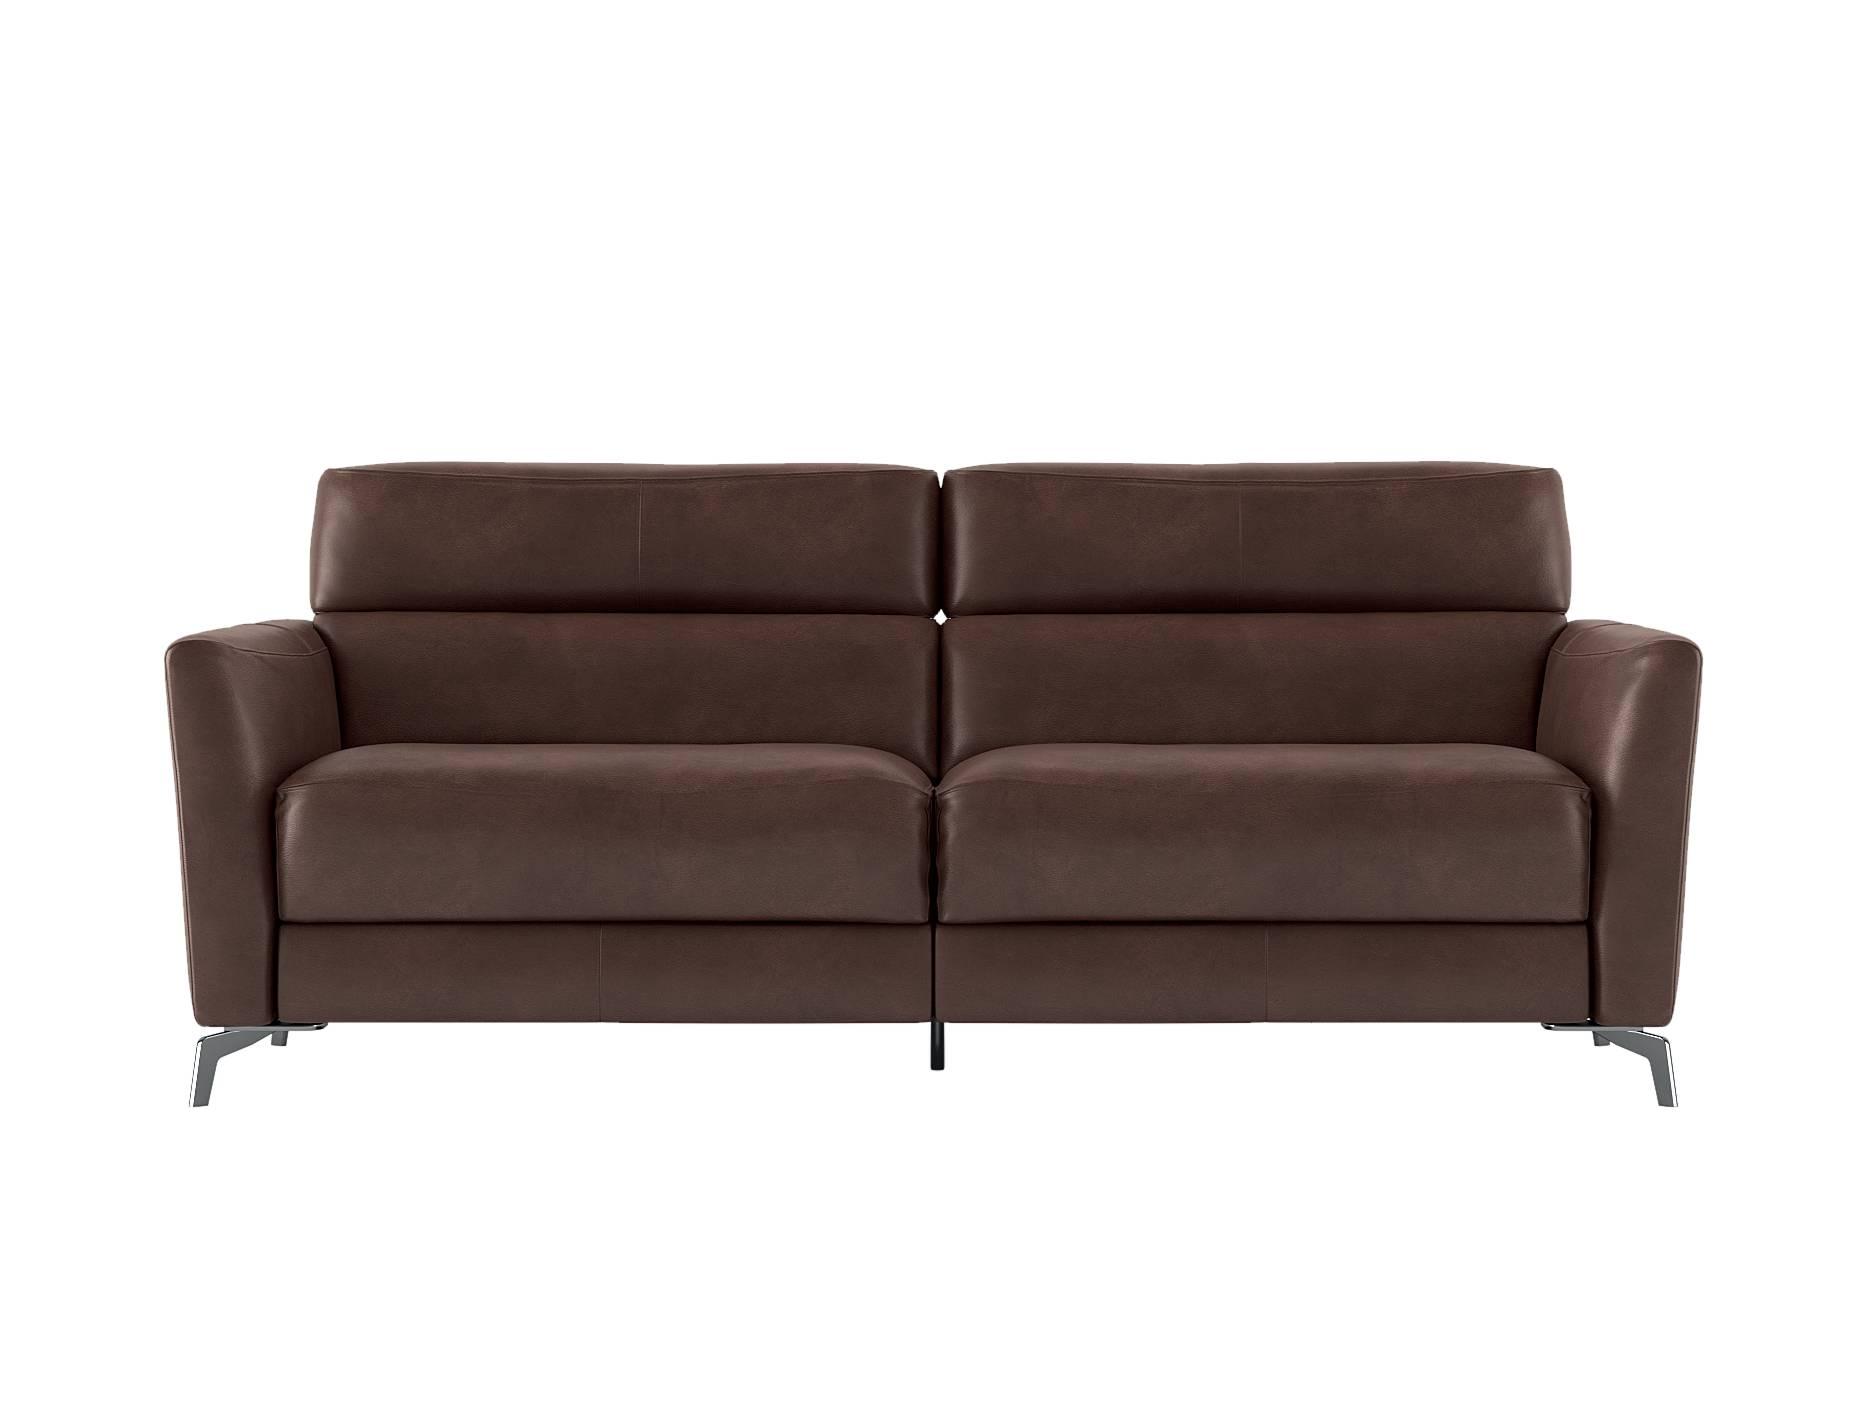 Natuzzi Italia Stan 3035 3-seater sofa with power recliners